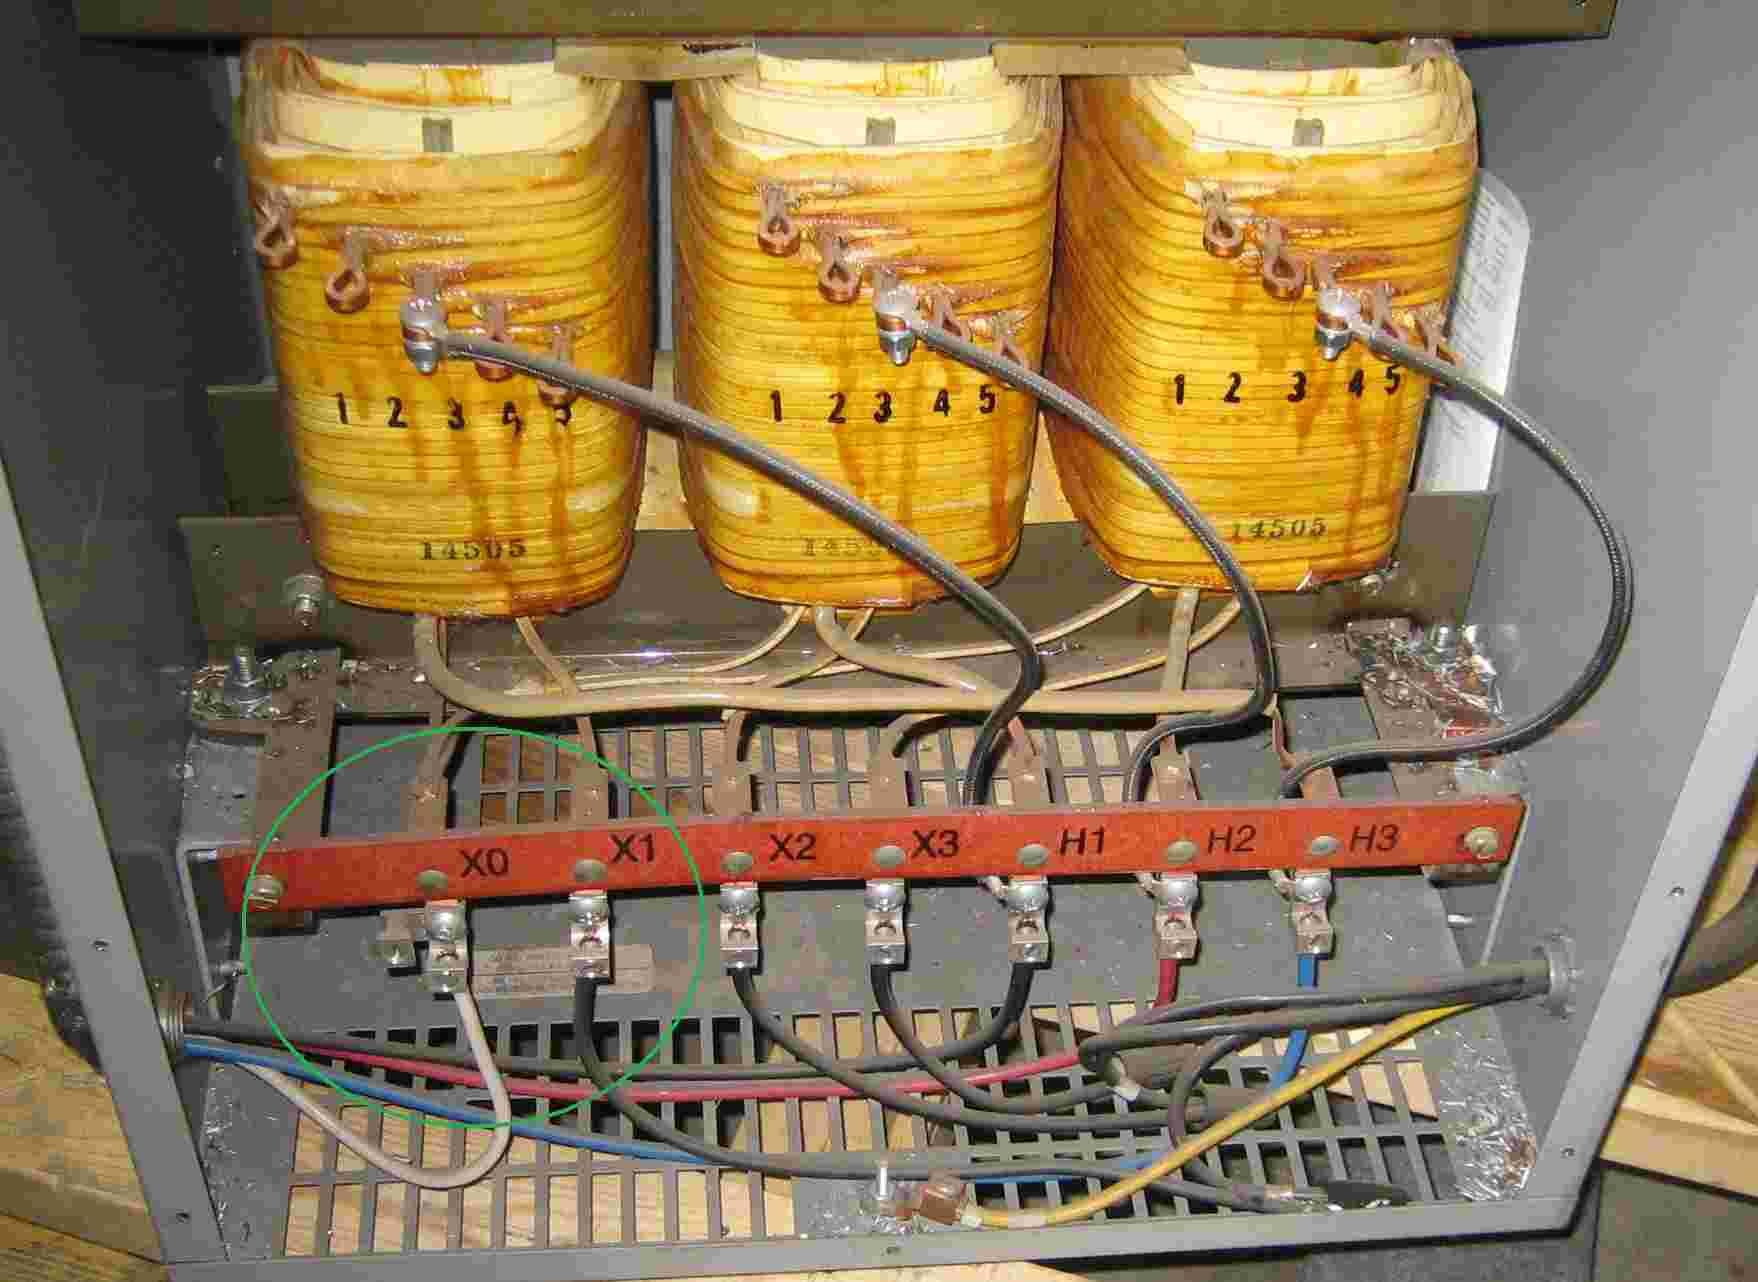 Transformer / Rotary Phase Converter Questions - 24 Volt Transformer Wiring Diagram